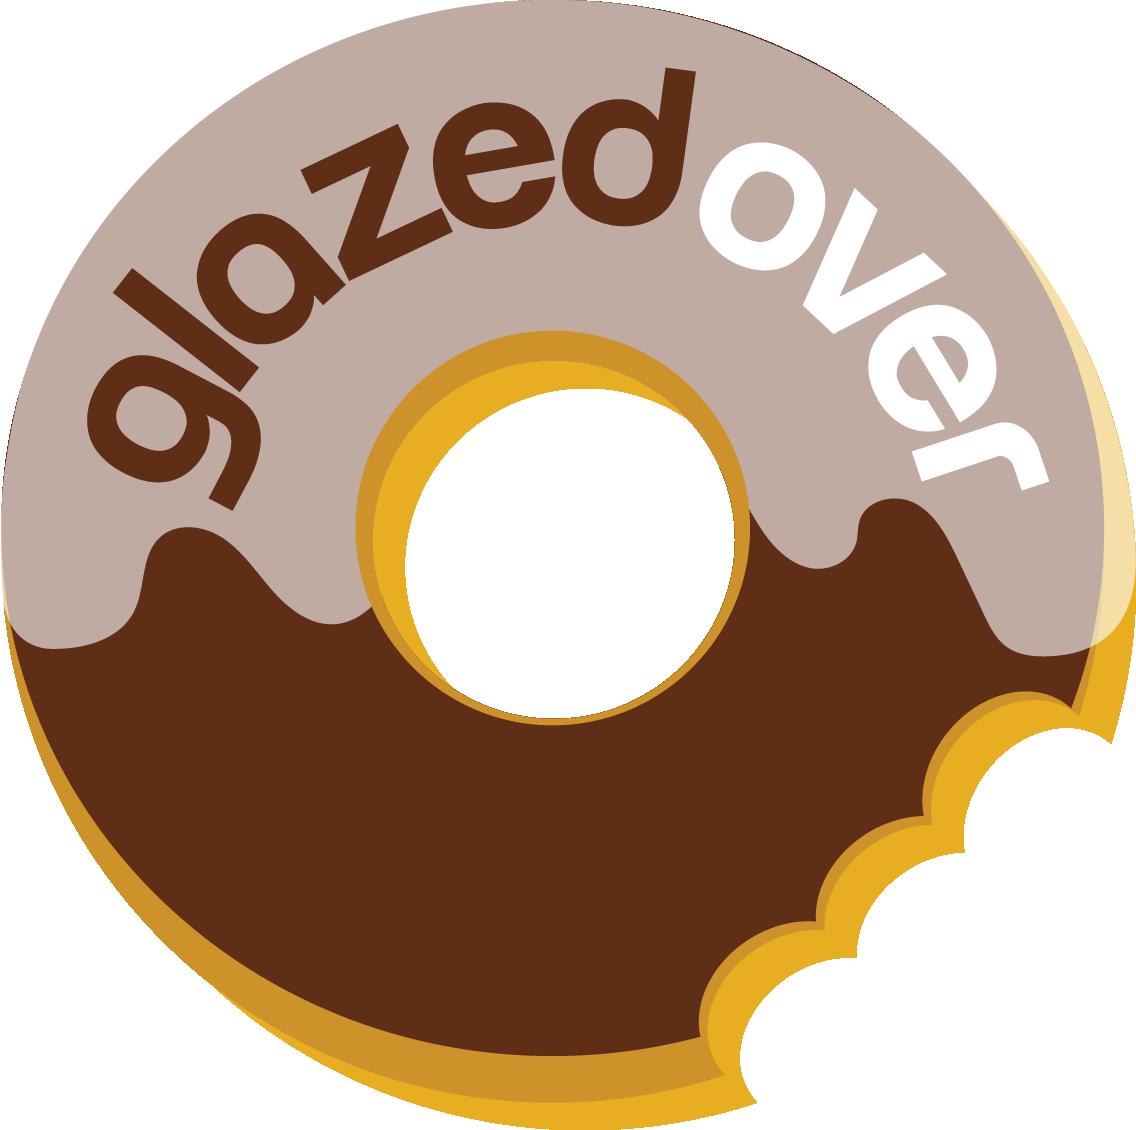 Glazedover . Doughnut clipart cream filled donut